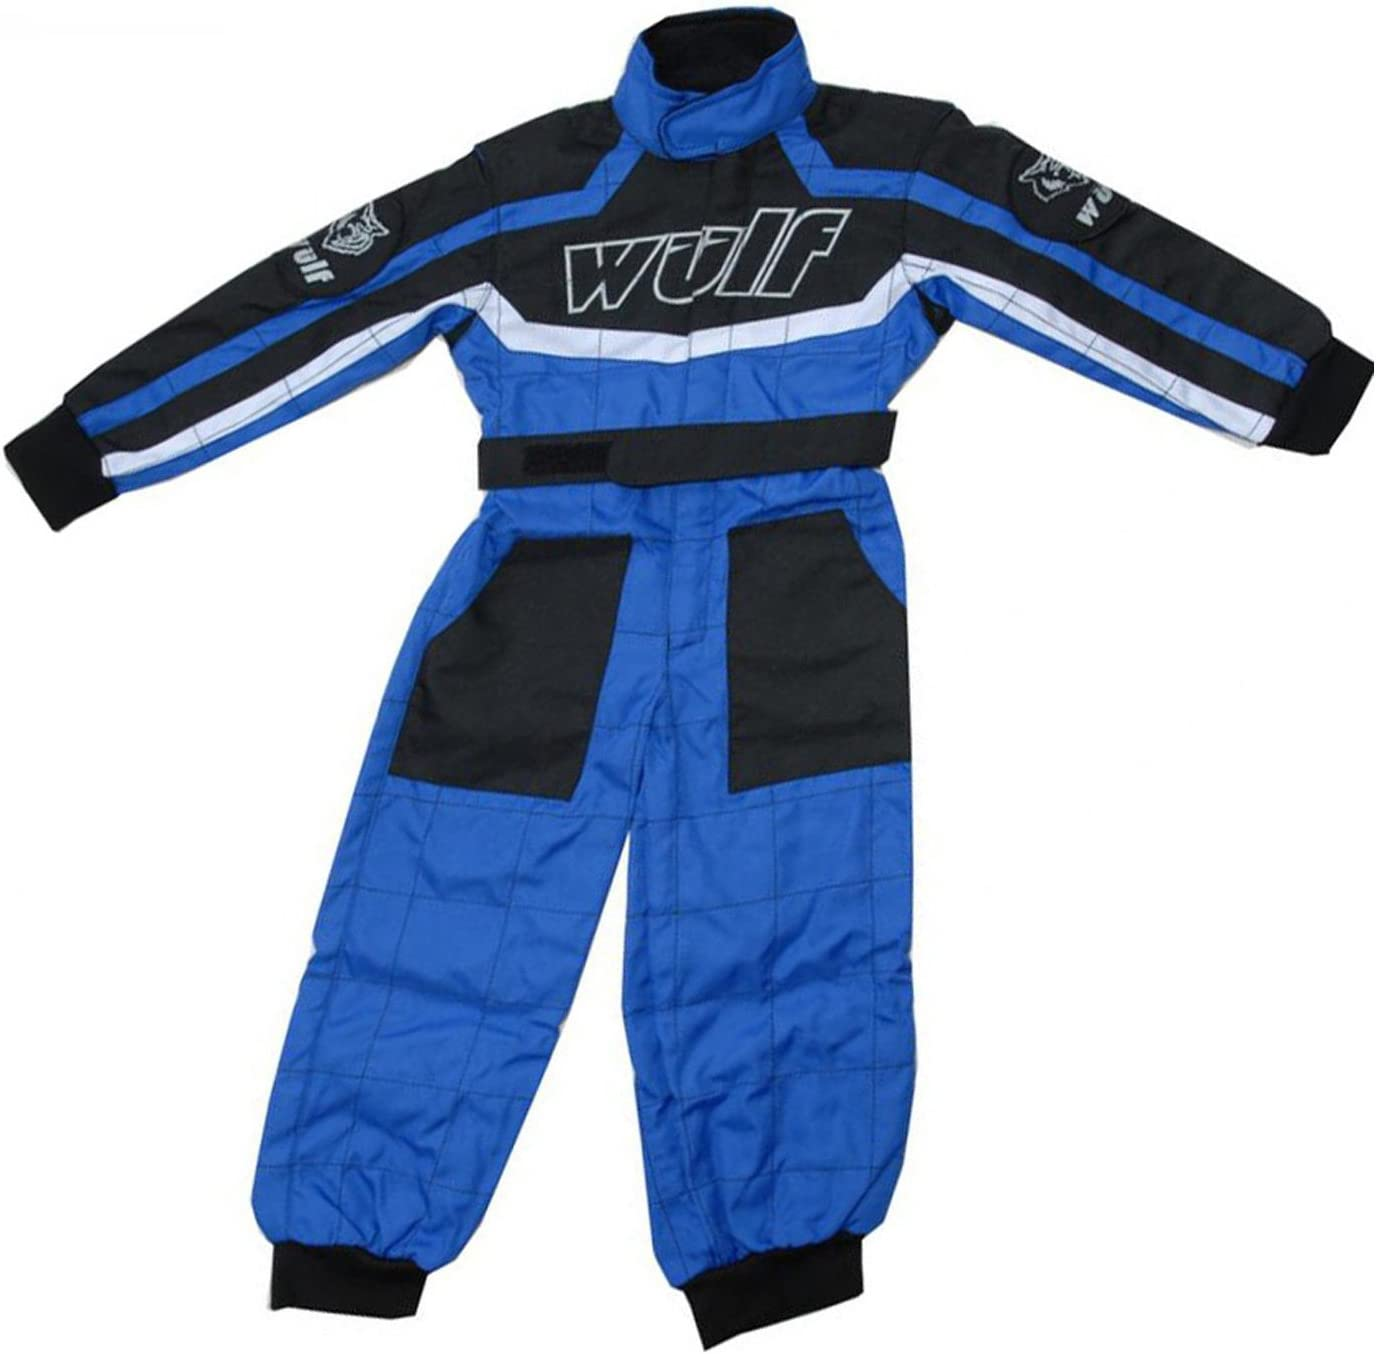 3-4 Yrs Wulfsport Children Kids Race MX Motocross Motorbike Suit Clothing Blue XS